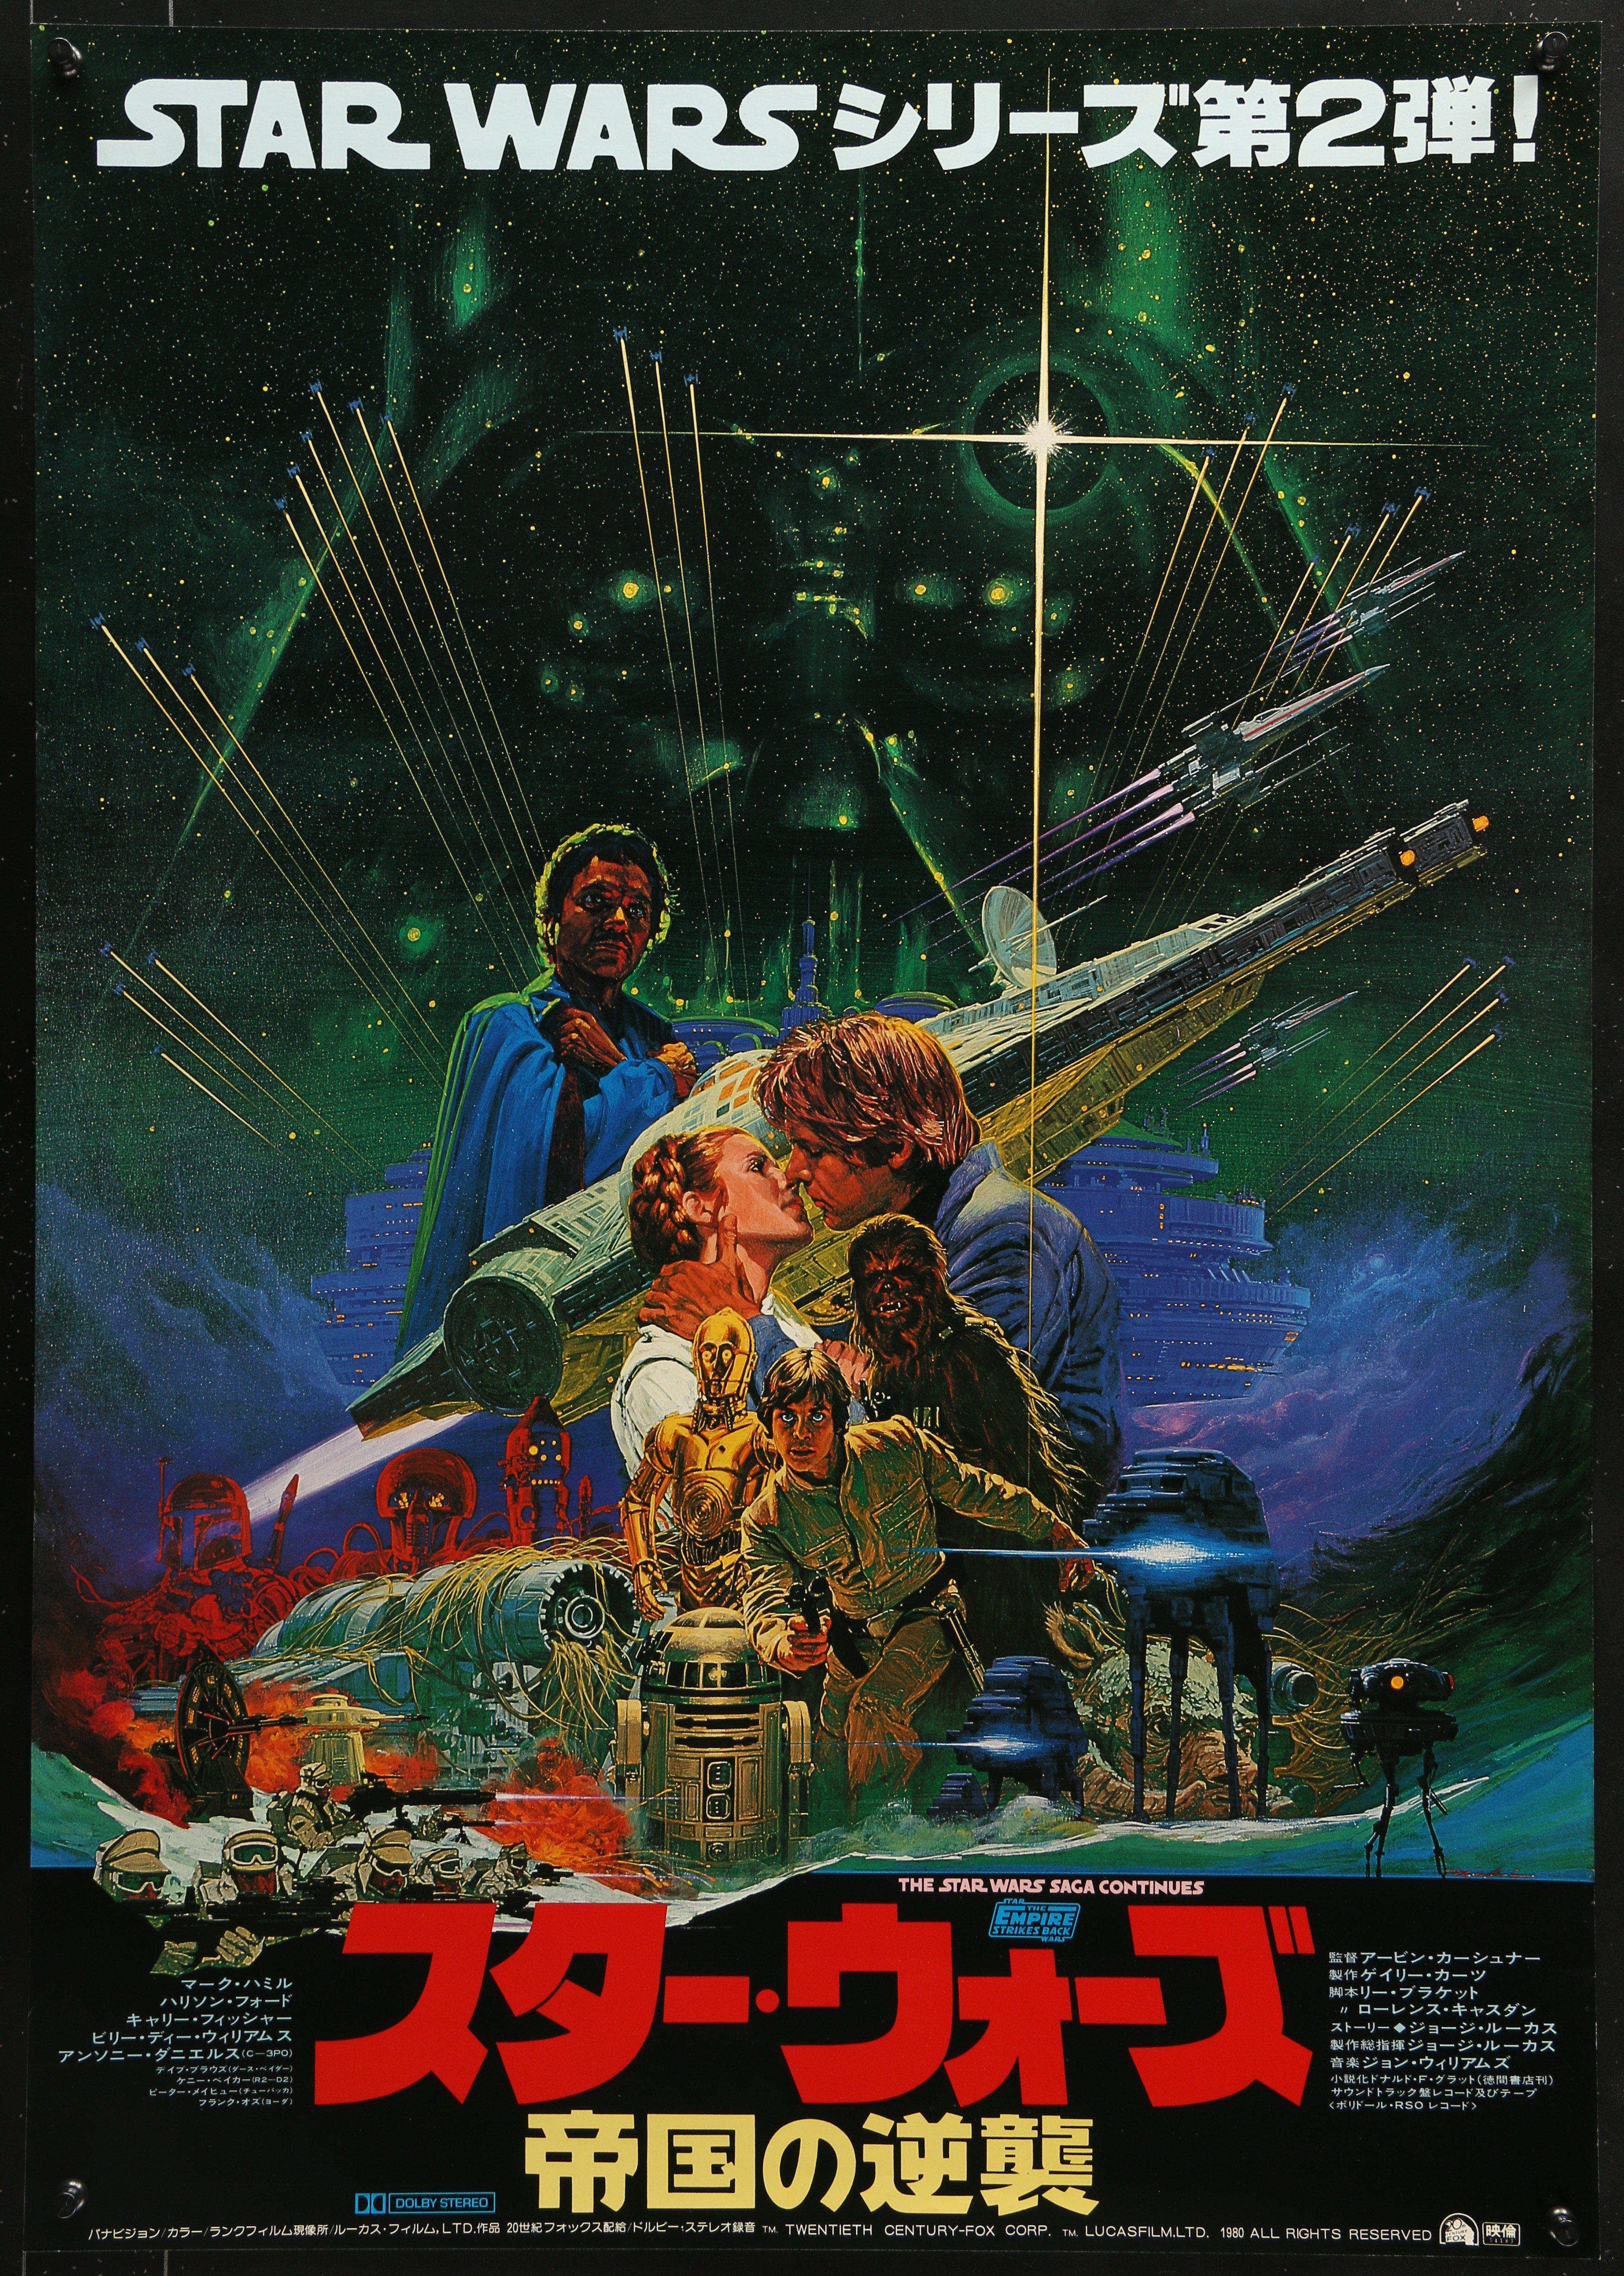 The Empire Strikes Back Japanese poster 2